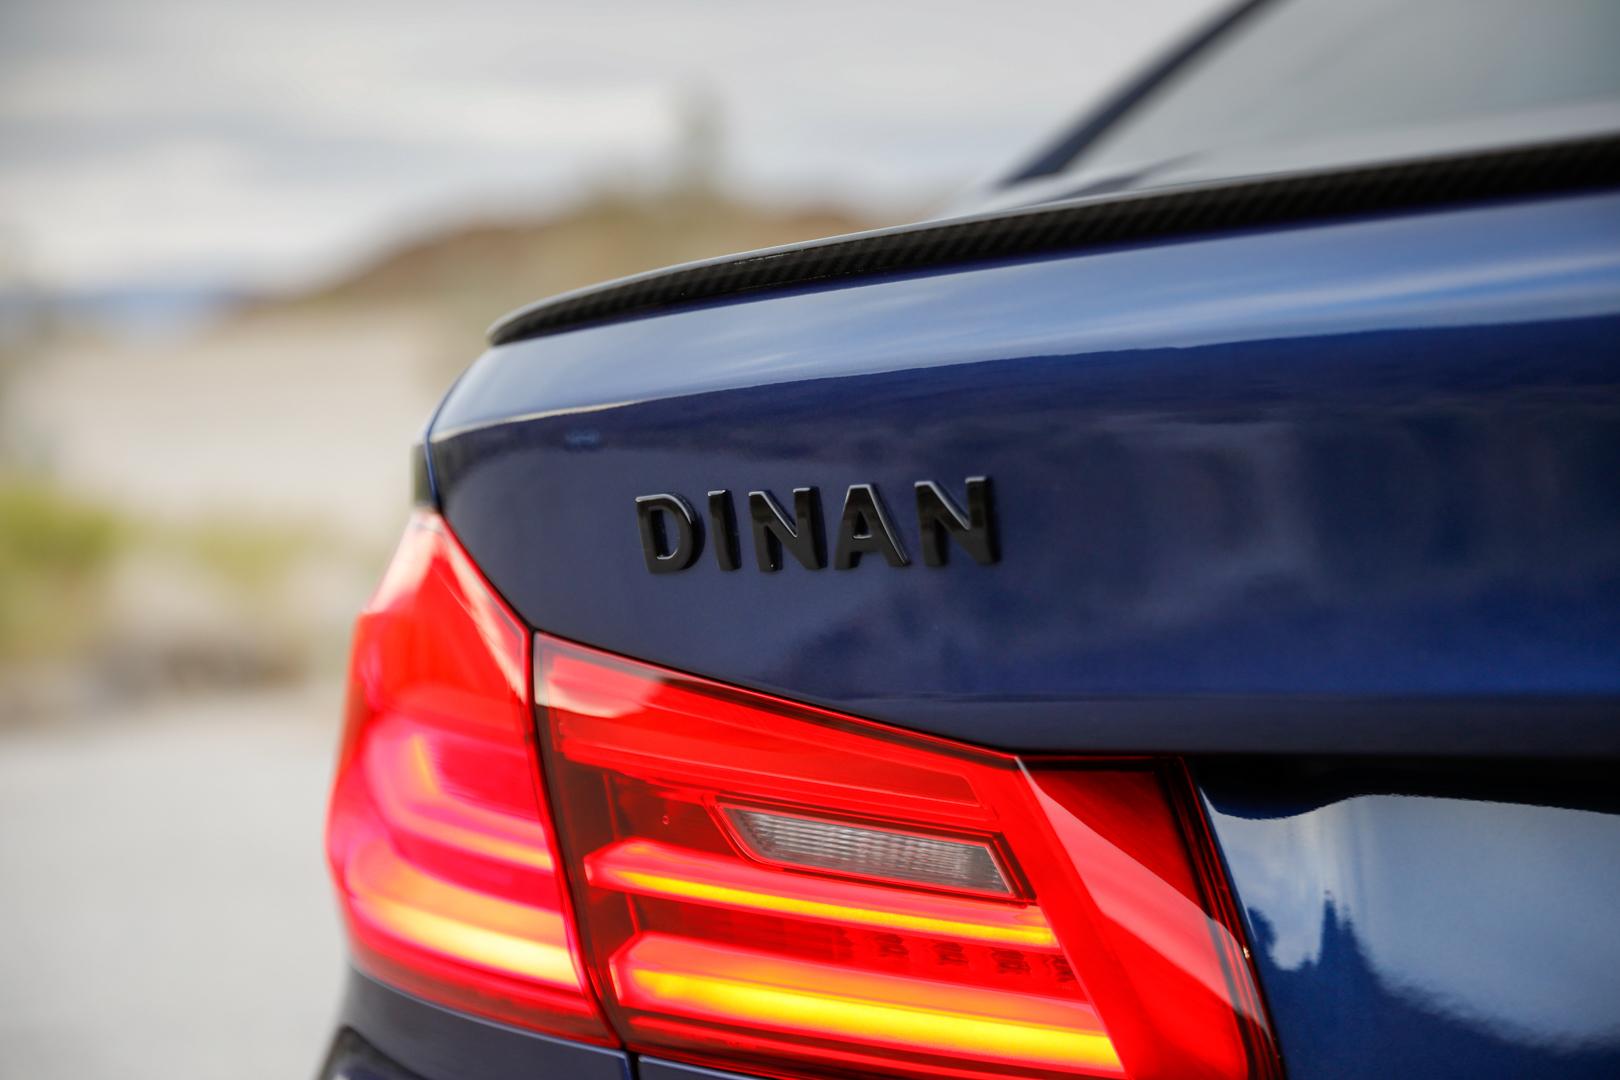 Dinan 335i Vs E92 M3